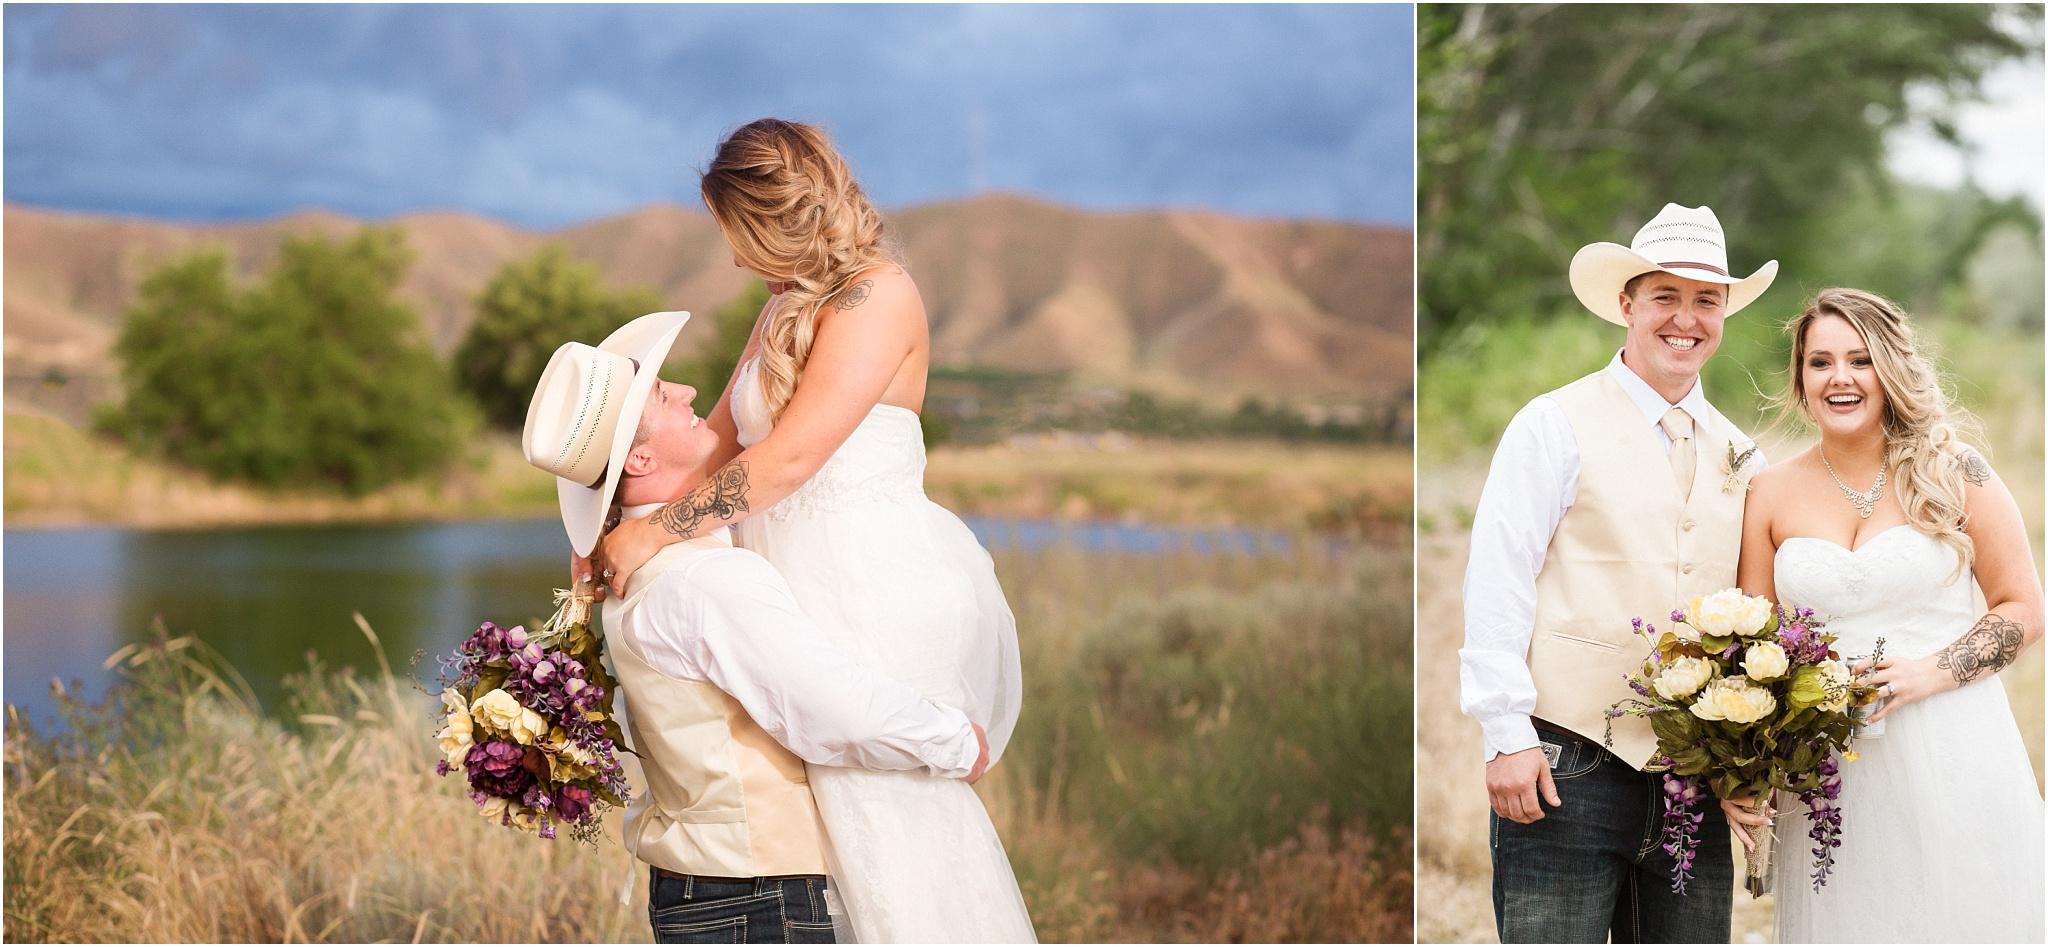 Wedding Photography_Emmett Idaho_Boise Idaho_Leah Southwick Photography_0047.jpg